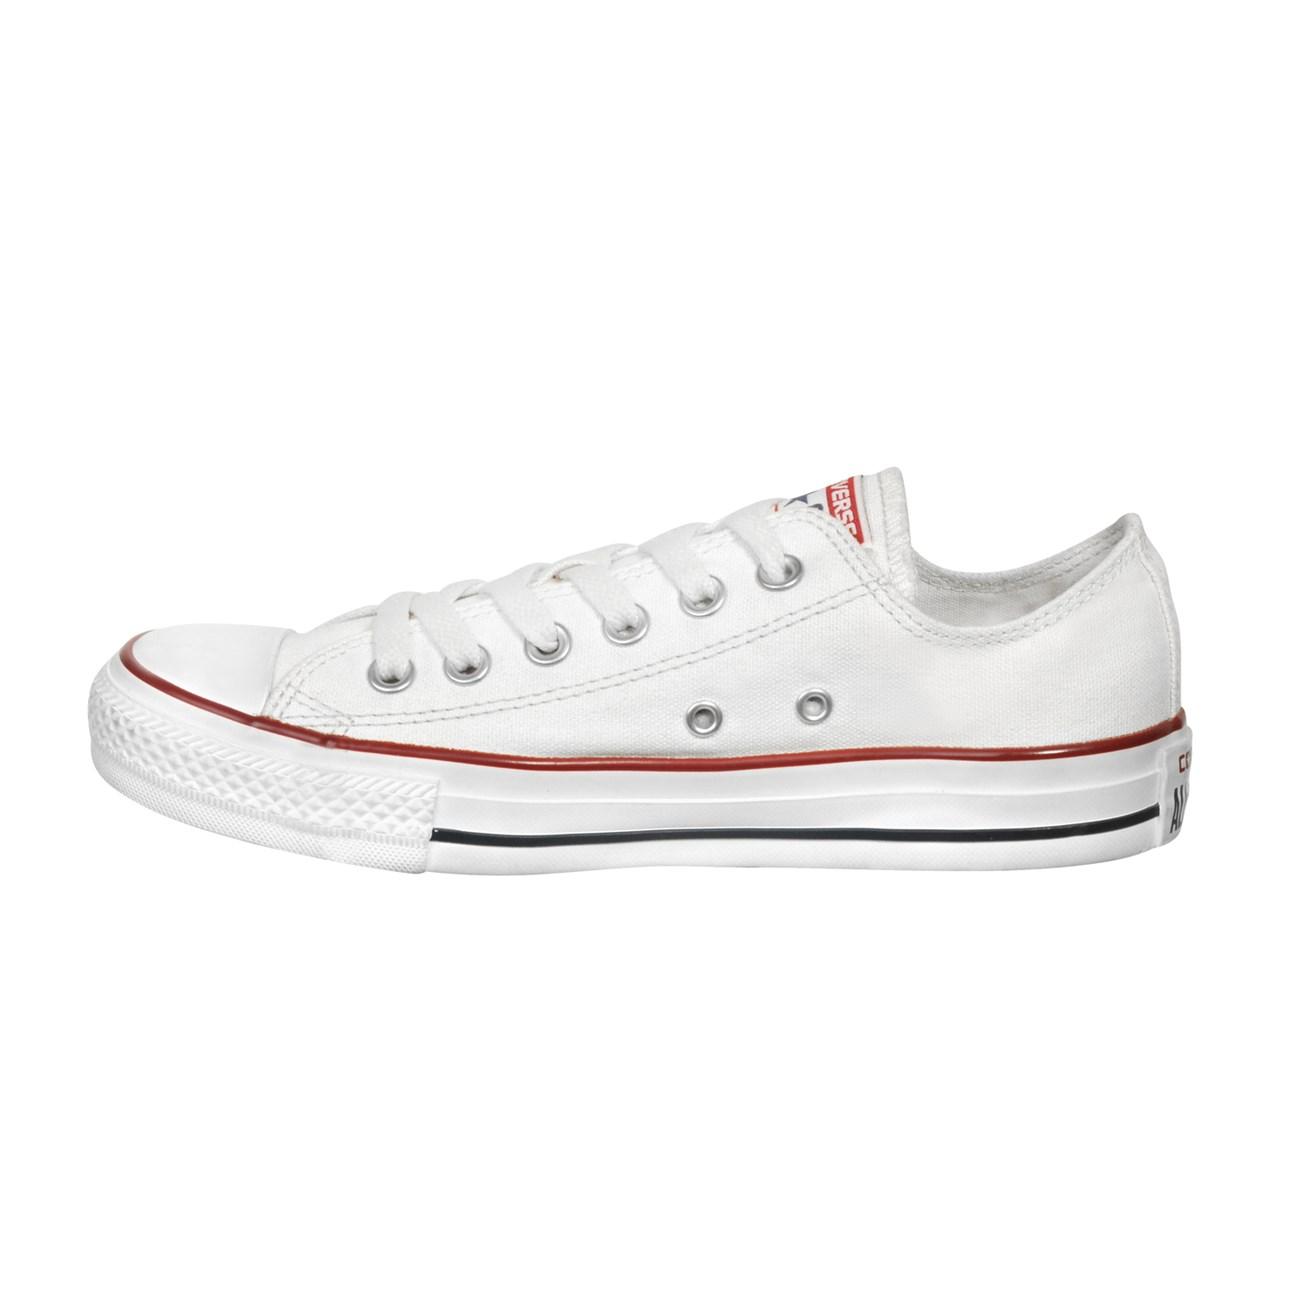 CONVERSE ALL STAR LOW   Sportstyle Παπούτσια  b119d3610ac